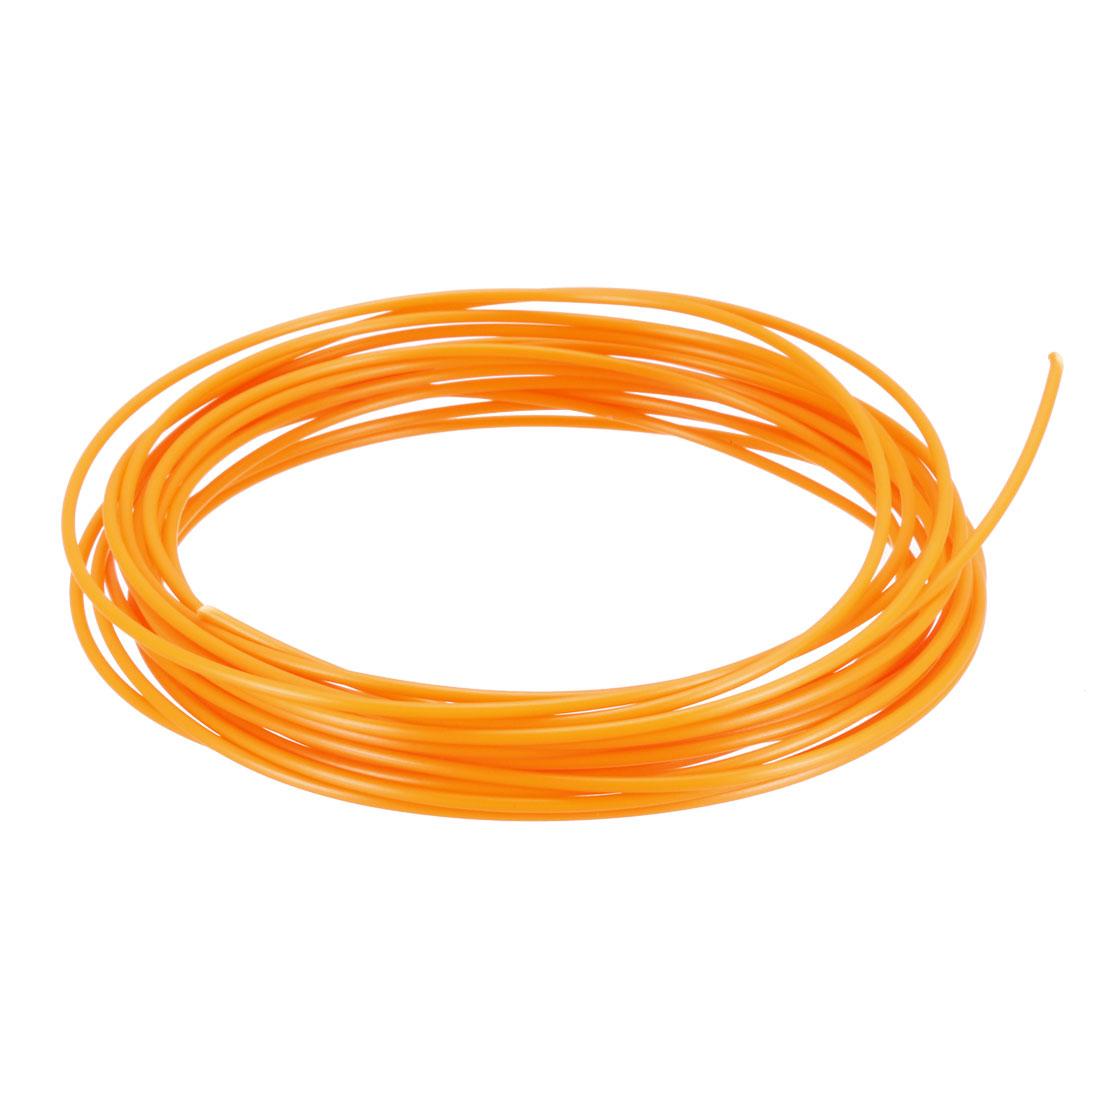 5 Meter/16 Ft PCL 3D Pen/3D Printer Filament, 1.75 mm Orange